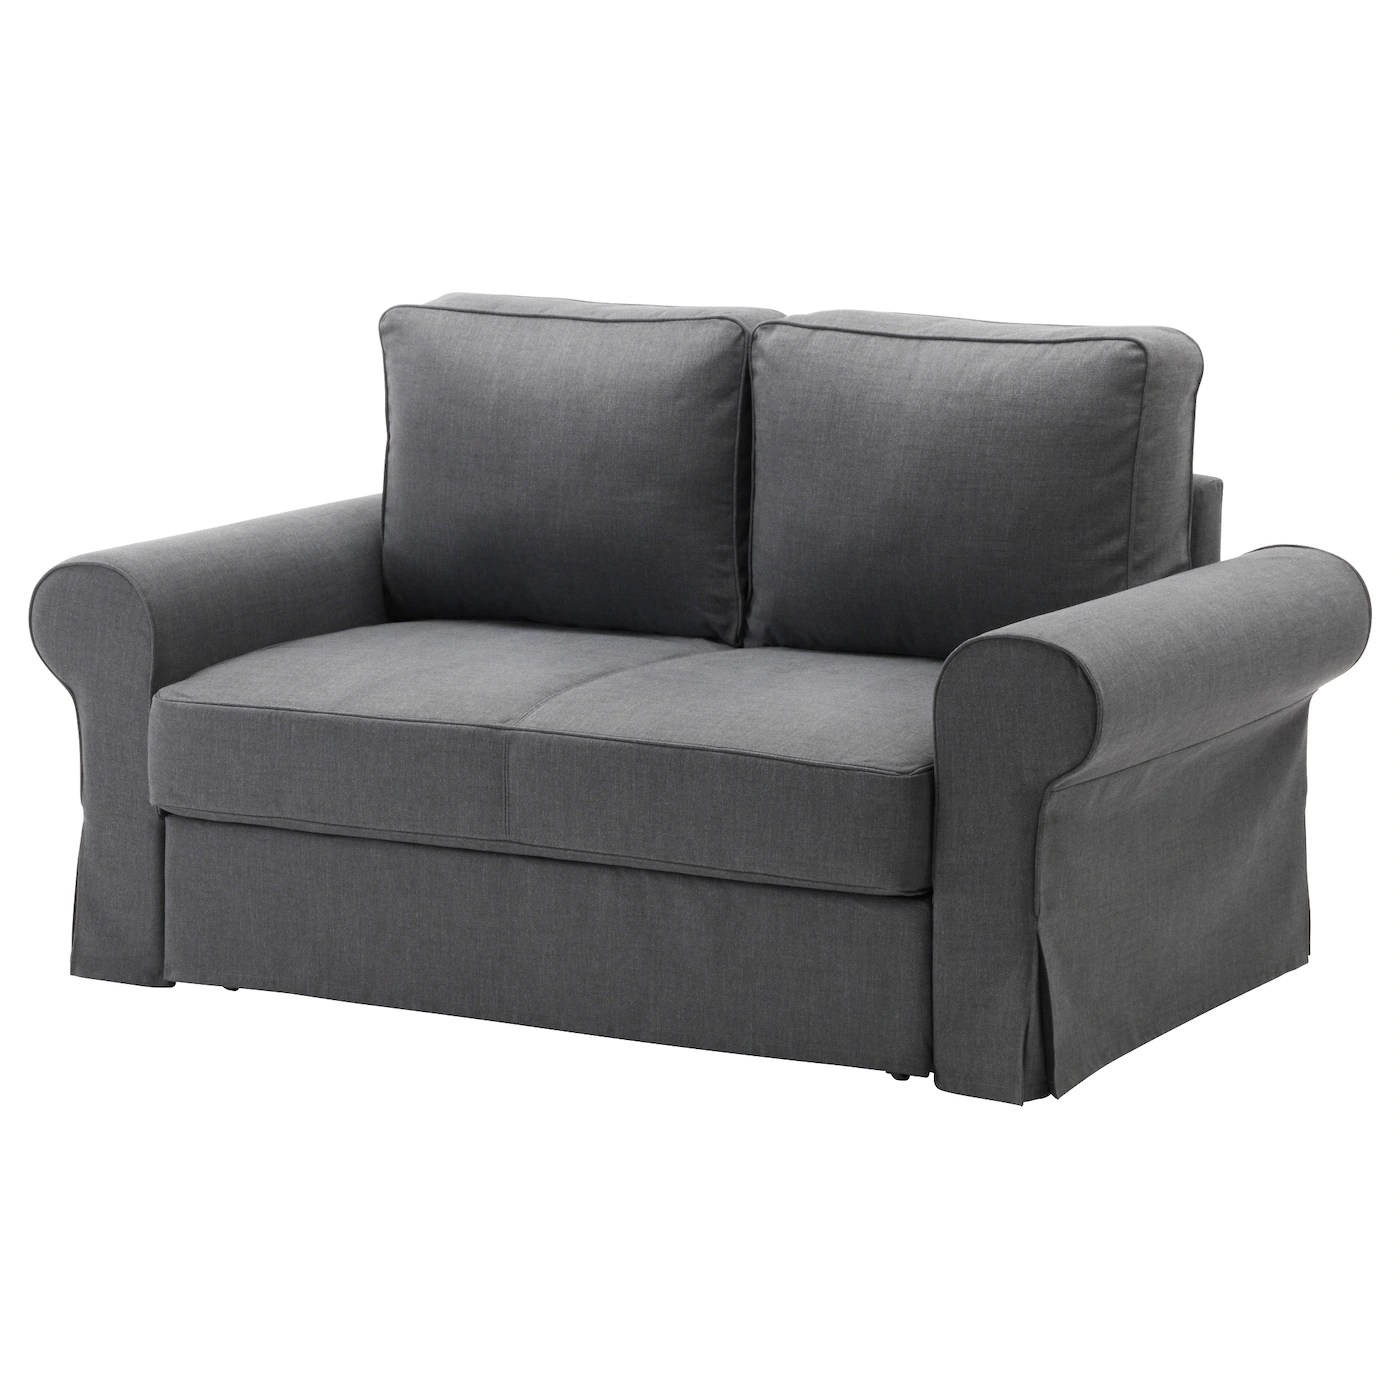 convertible chair bed ikea rustic lounge backabro two seat sofa nordvalla dark grey